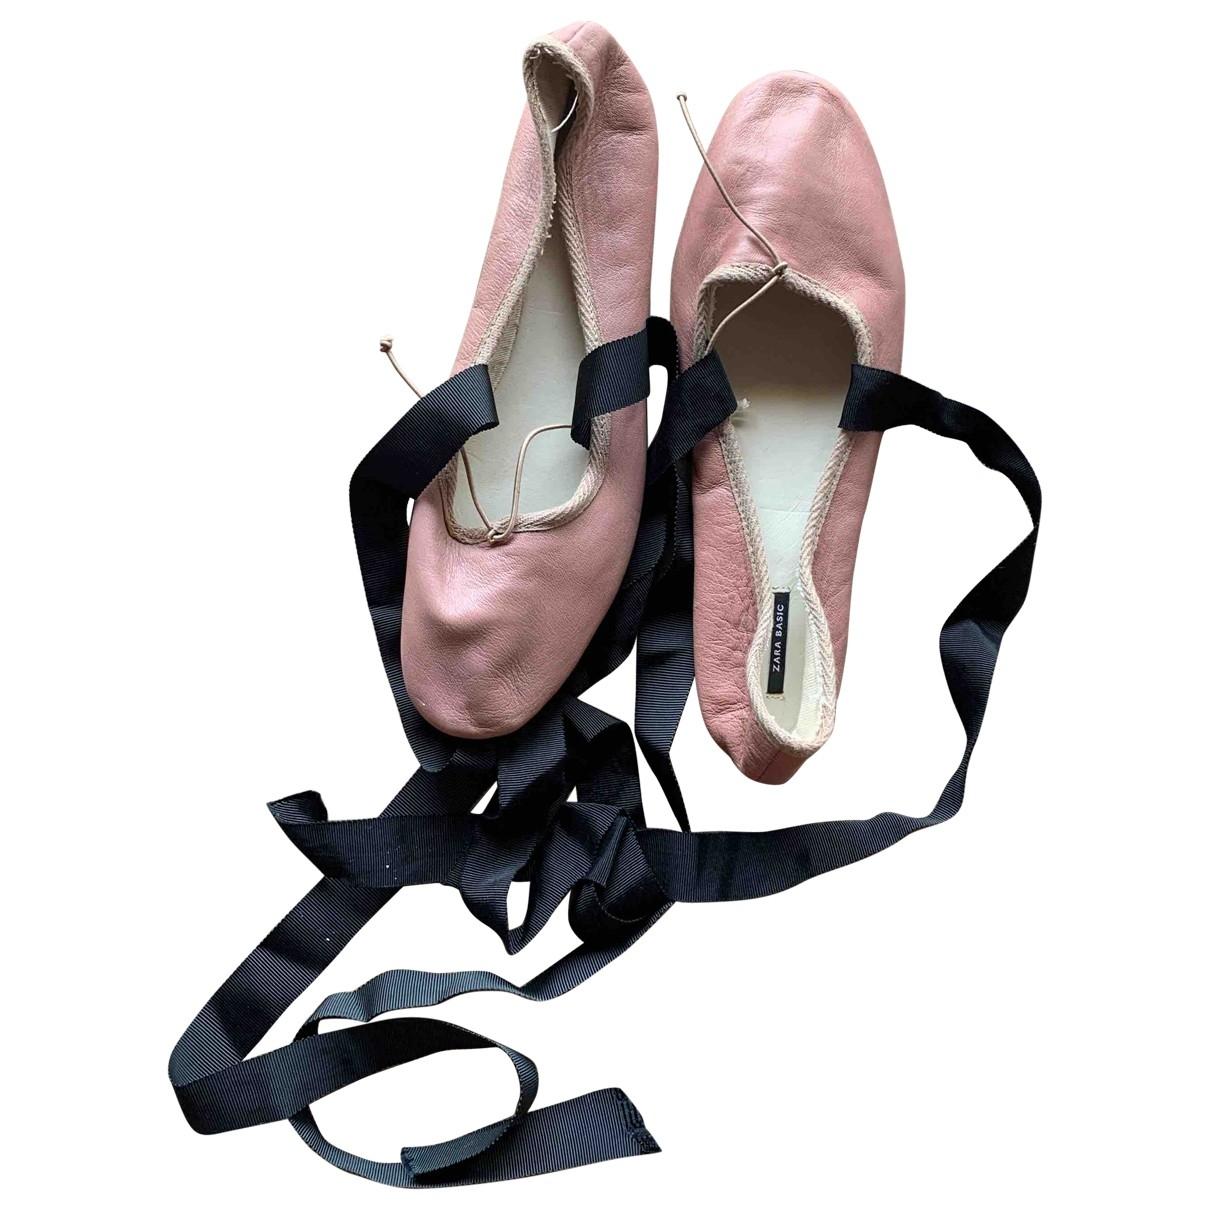 Bailarinas de Lona Zara